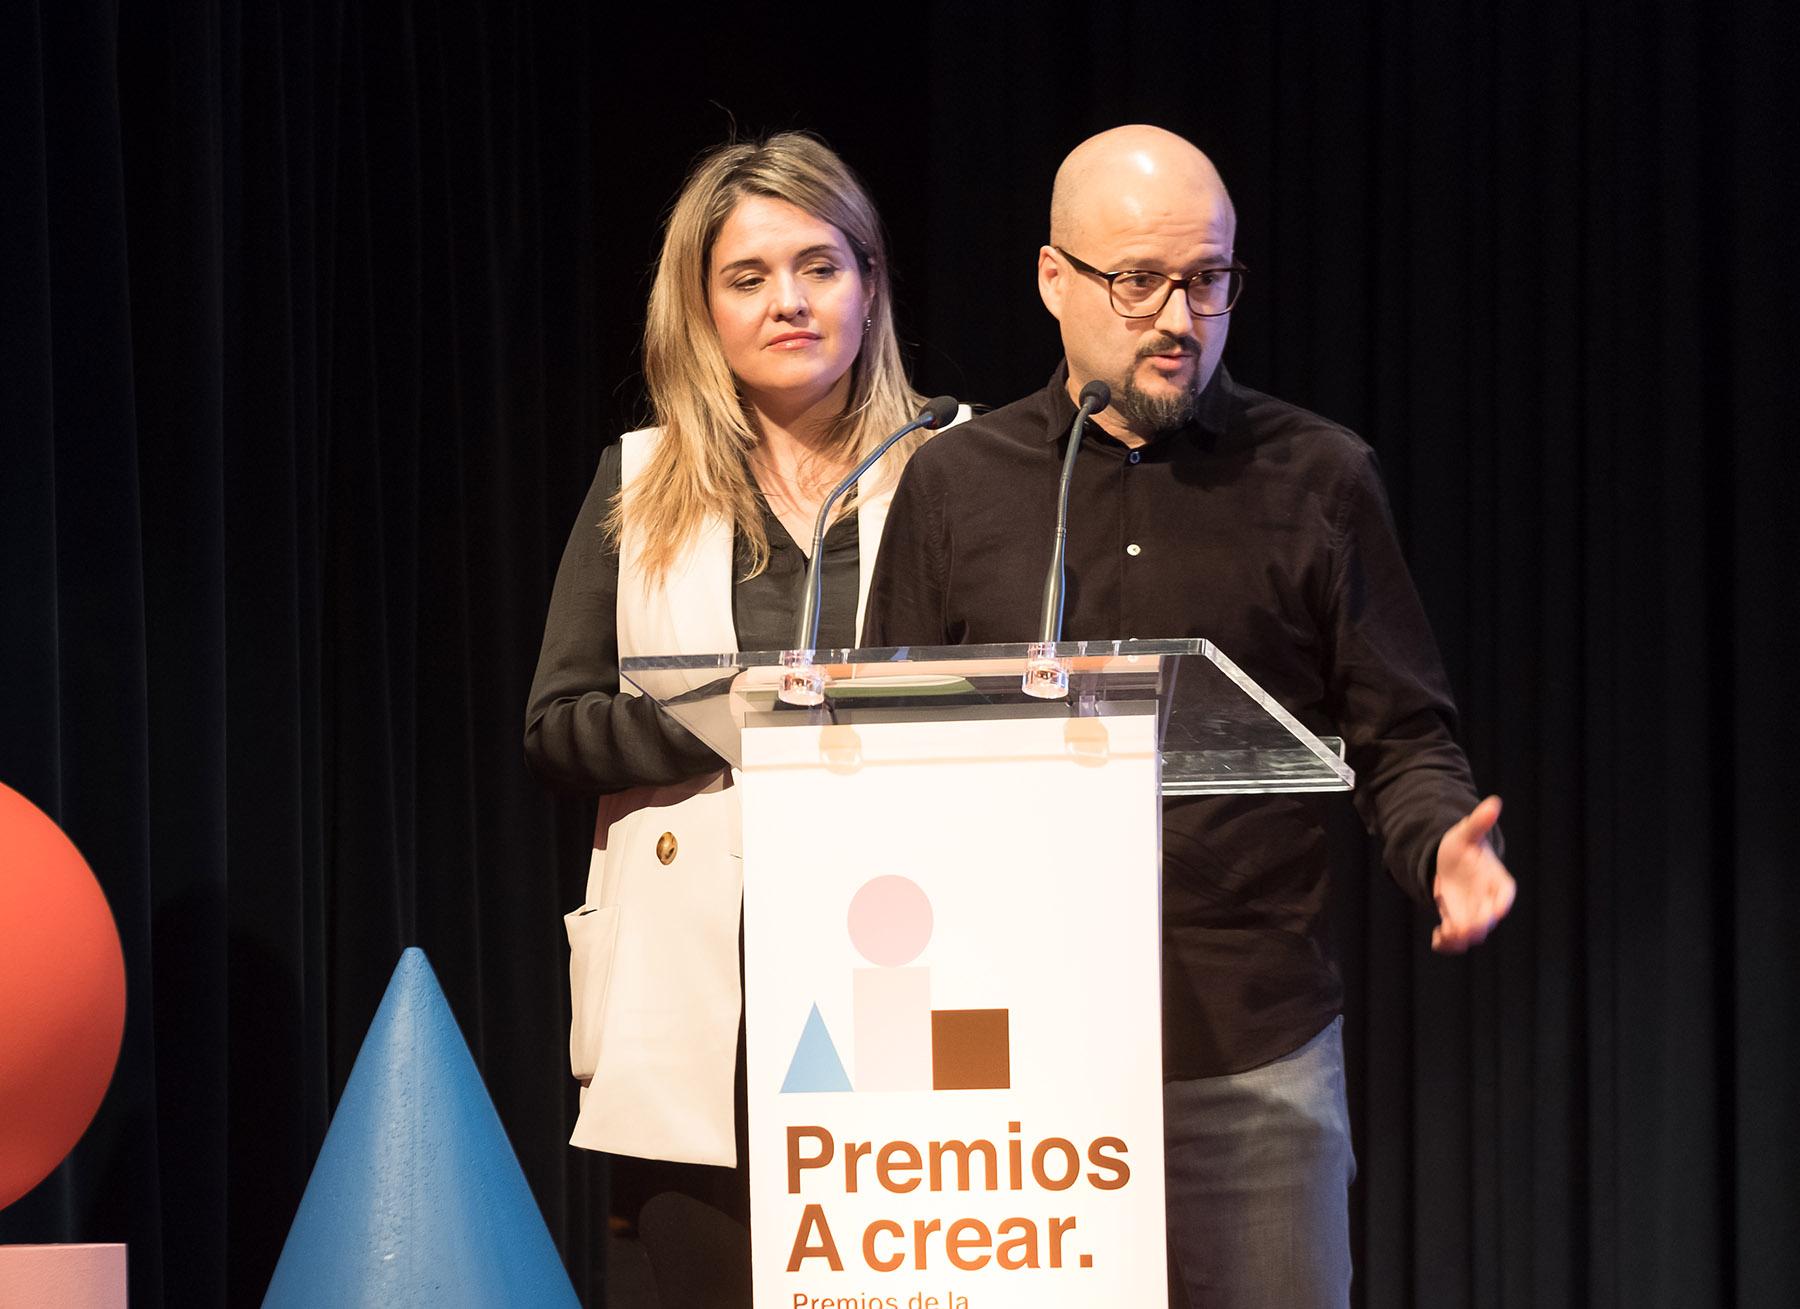 PREMIOSA-CREAR-FD-6100